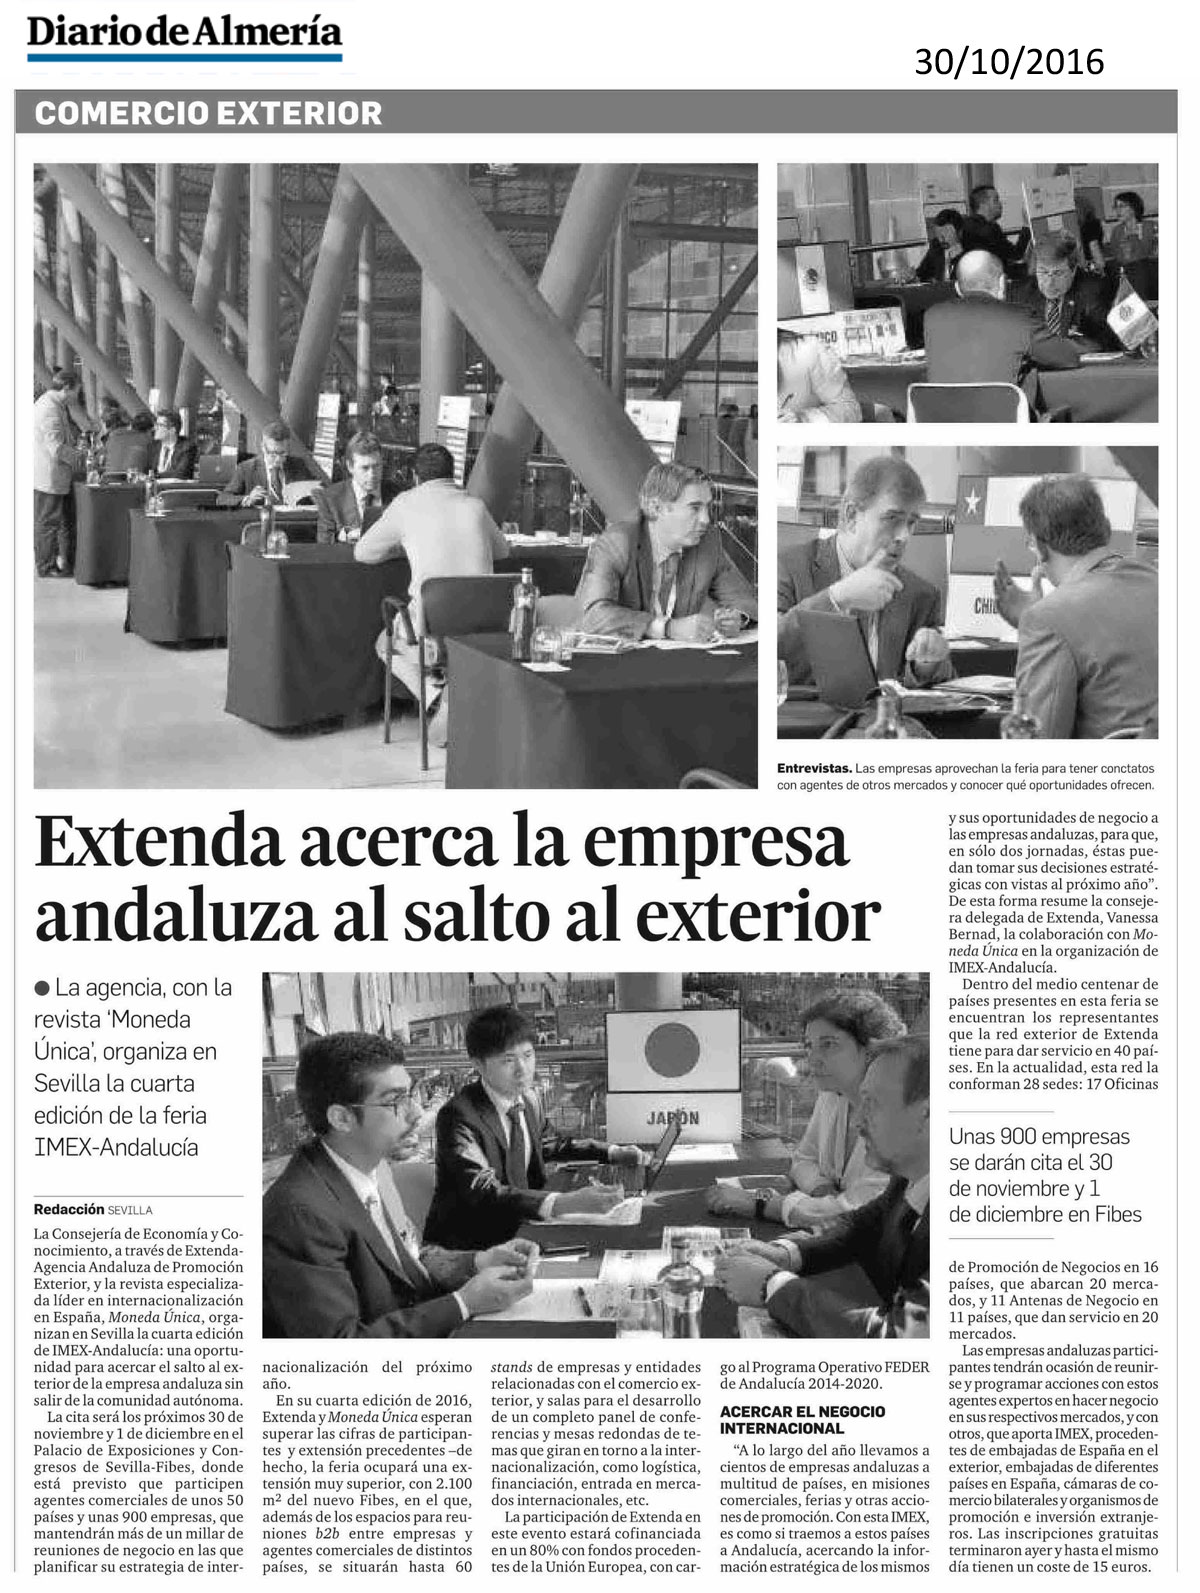 30102016-Diario-de-Almeria